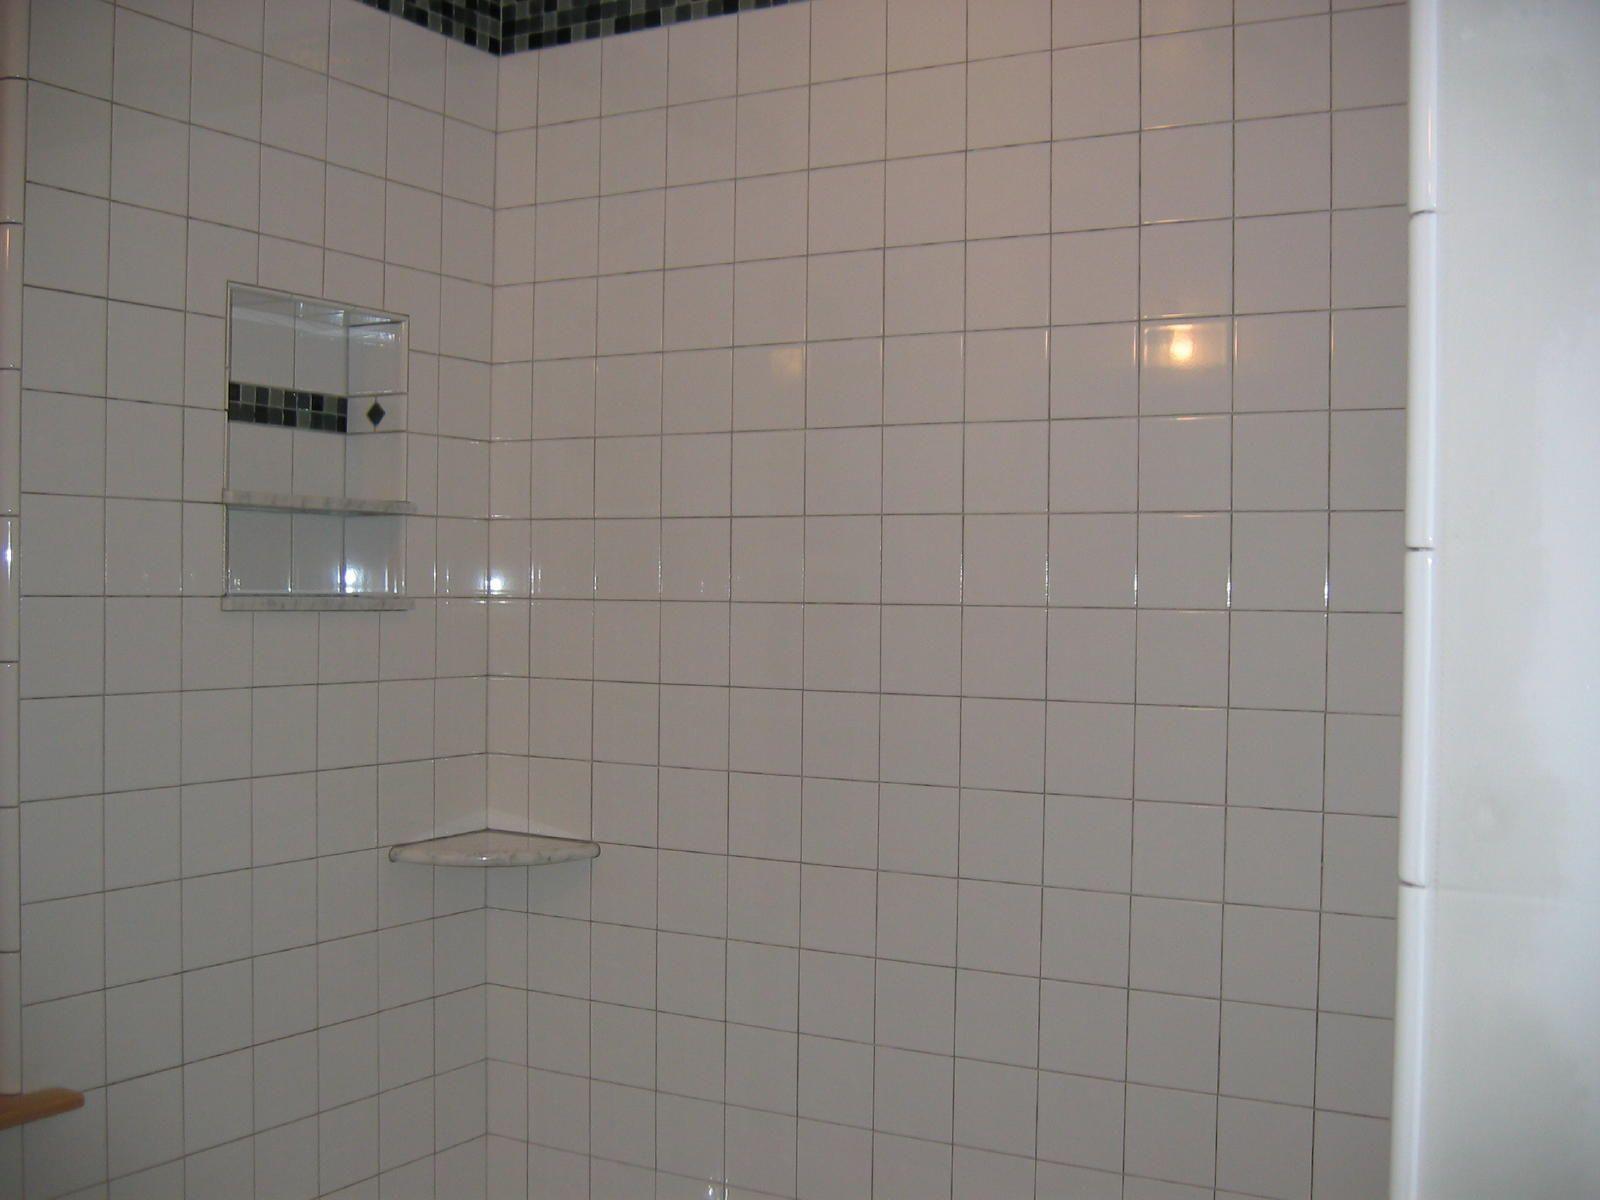 ceramic tile bathroom ideas old school tile designs ceramic rh pinterest com bathroom tile contractors fullerton ca bathroom tile contractors richmond va